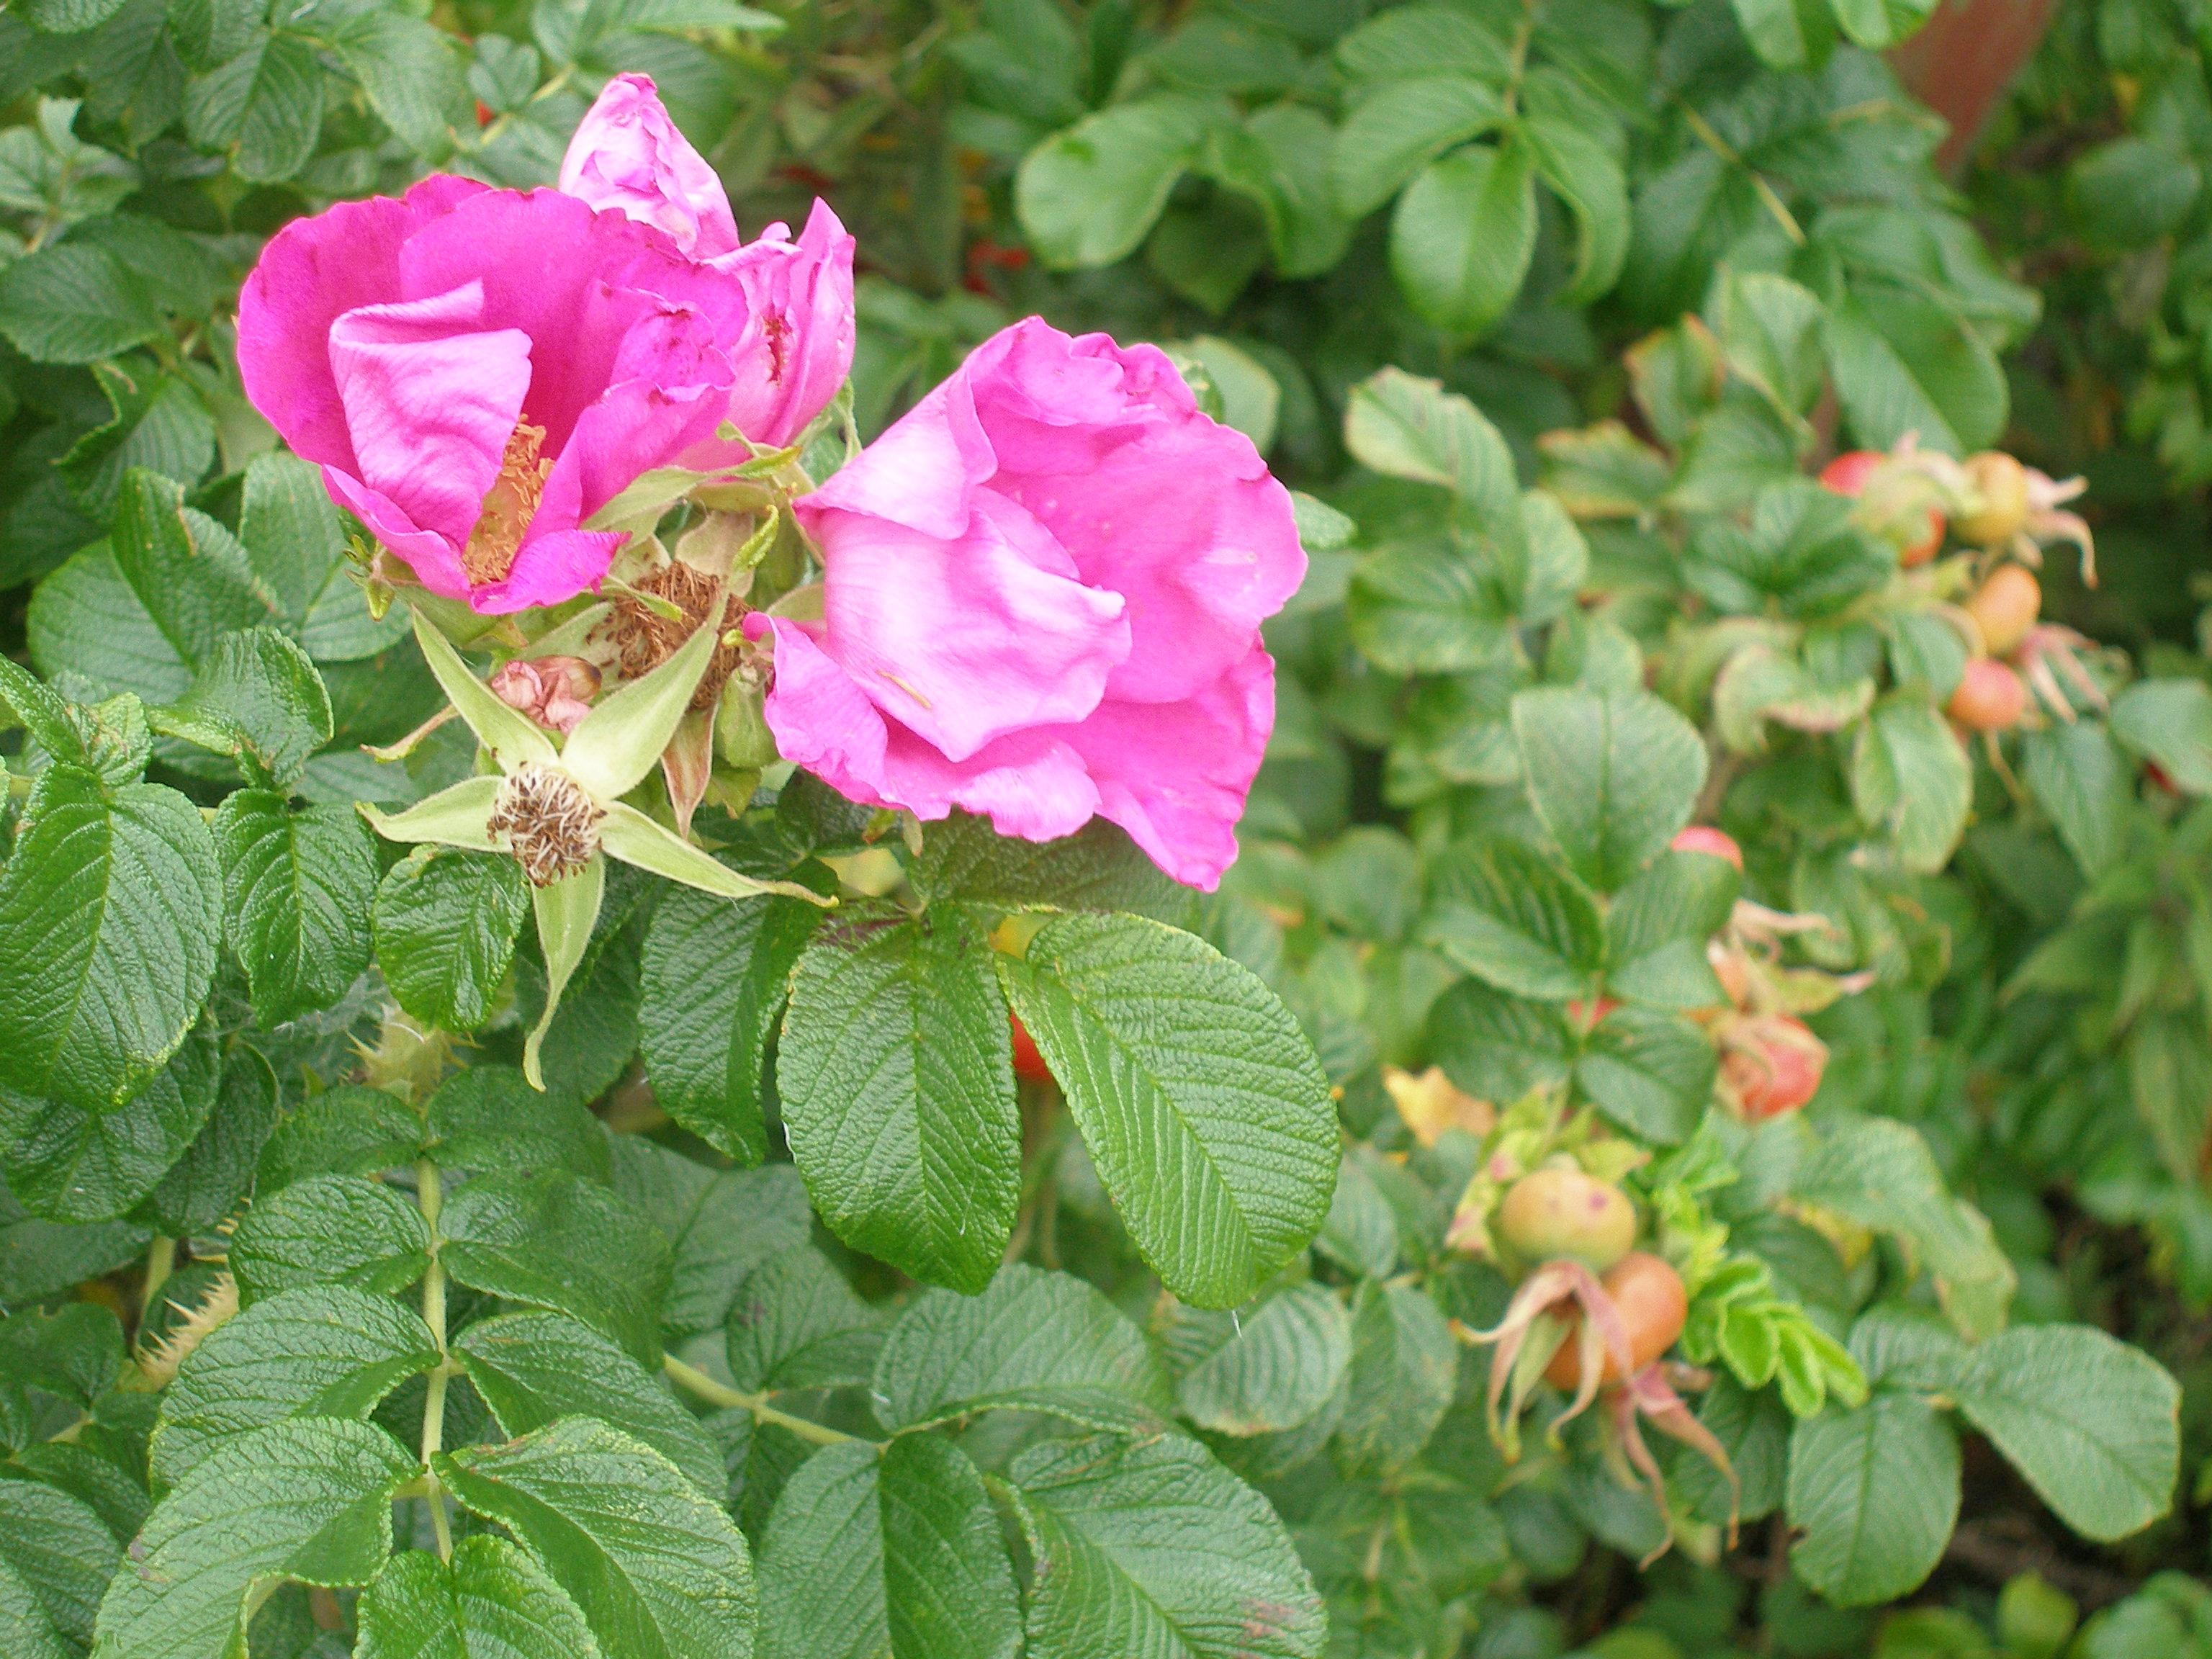 Depiction of Rosa gallica